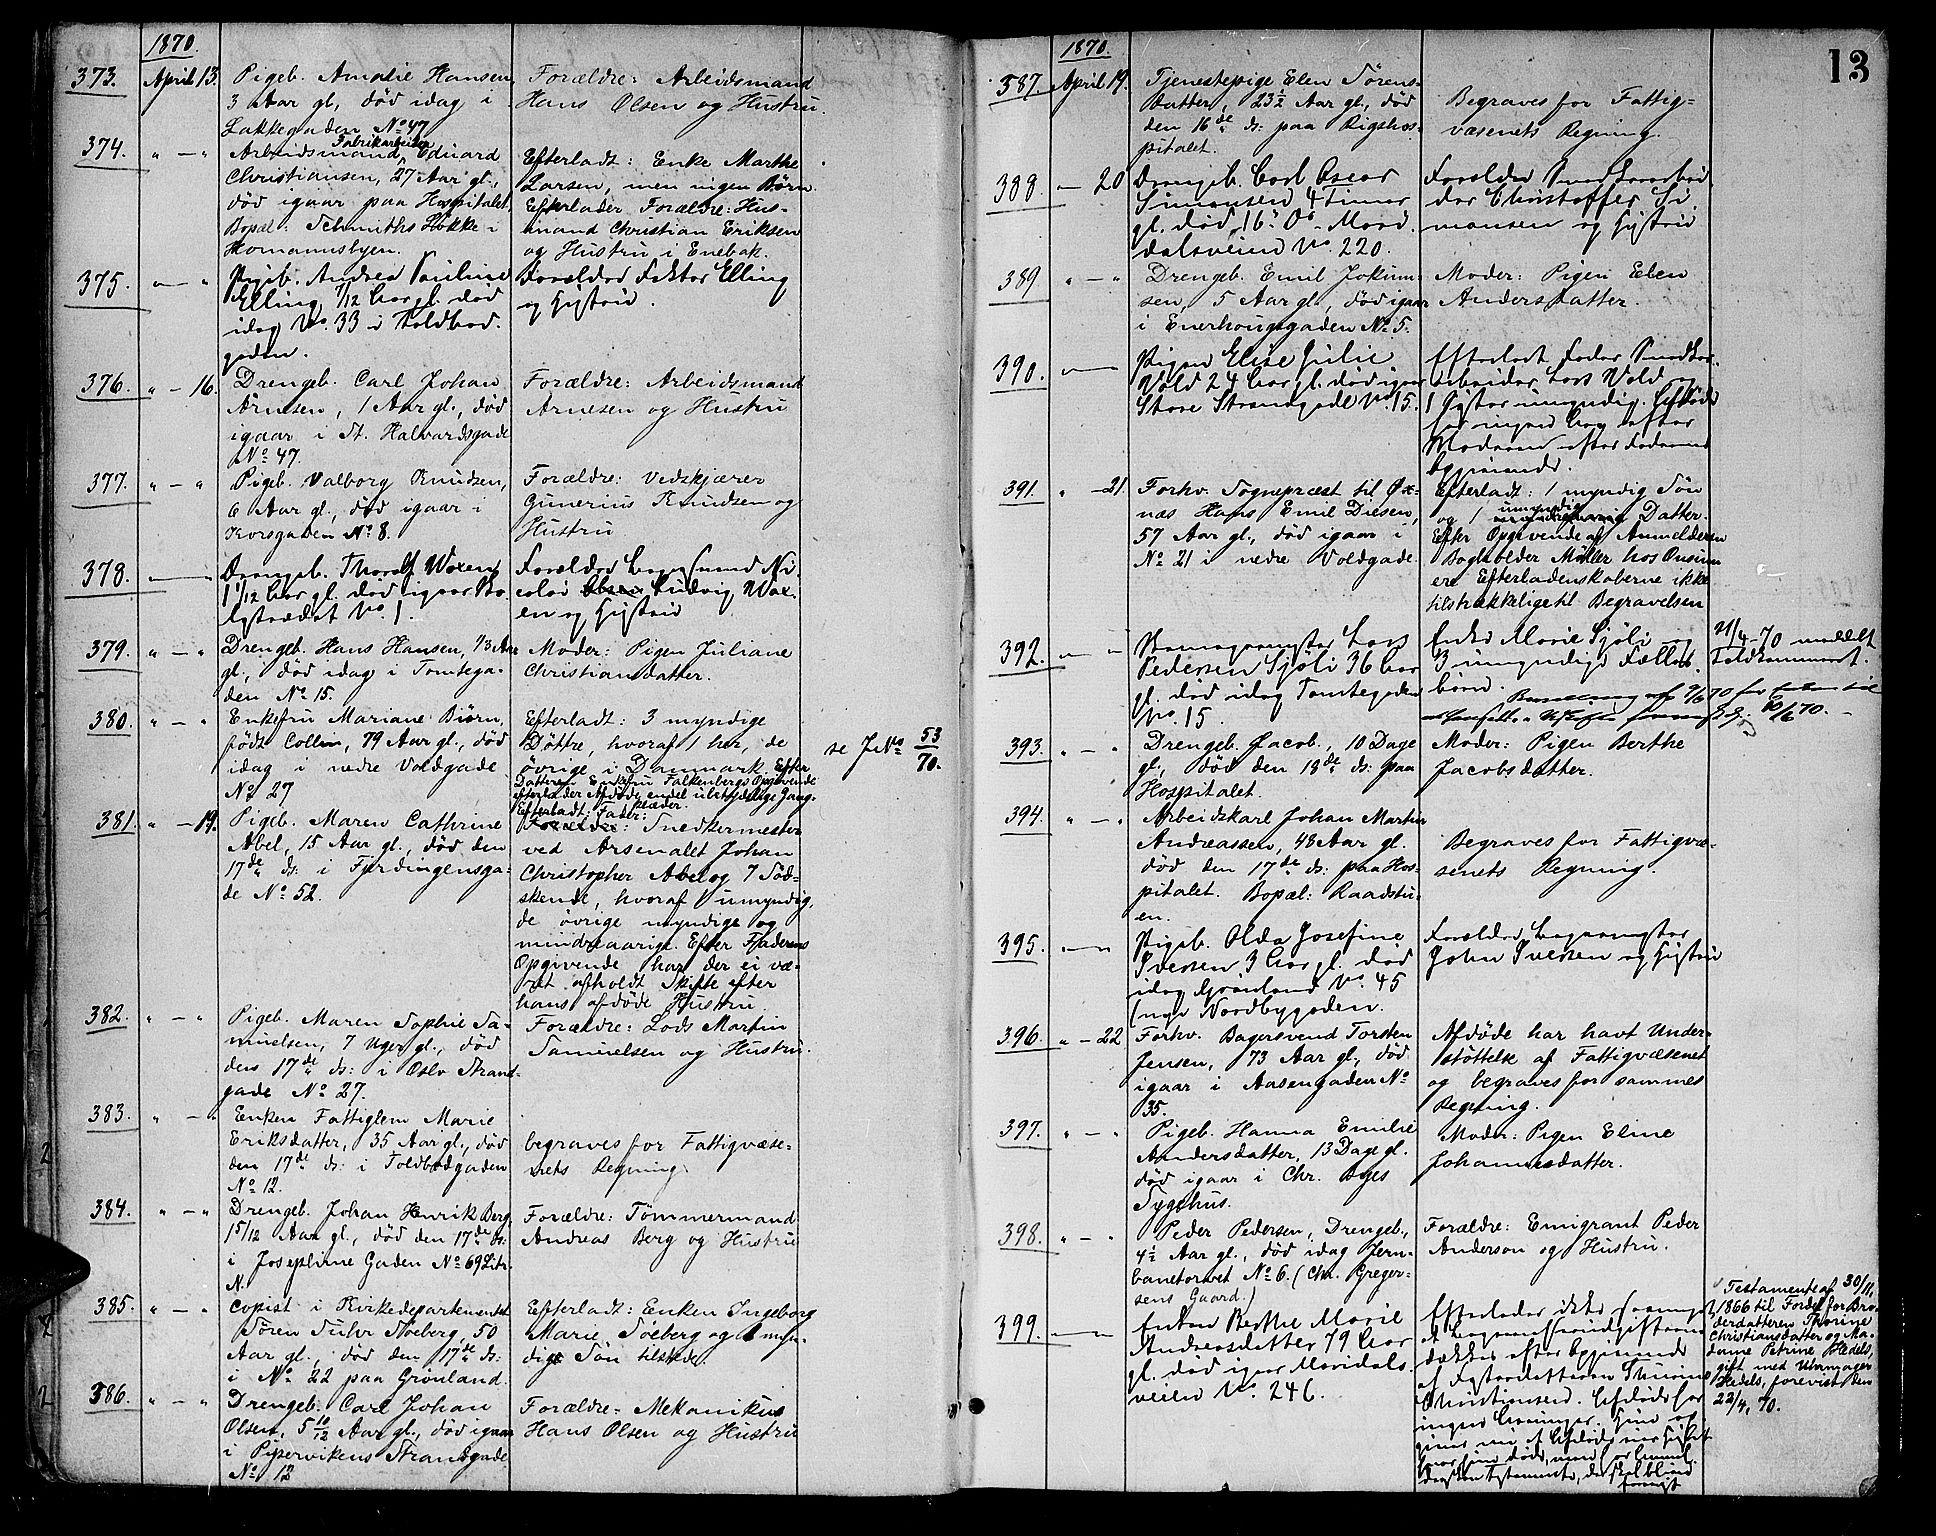 SAO, Oslo skifterett, G/Ga/Gaa/L0008: Dødsfallsprotokoll, 1870-1874, s. 12b-13a